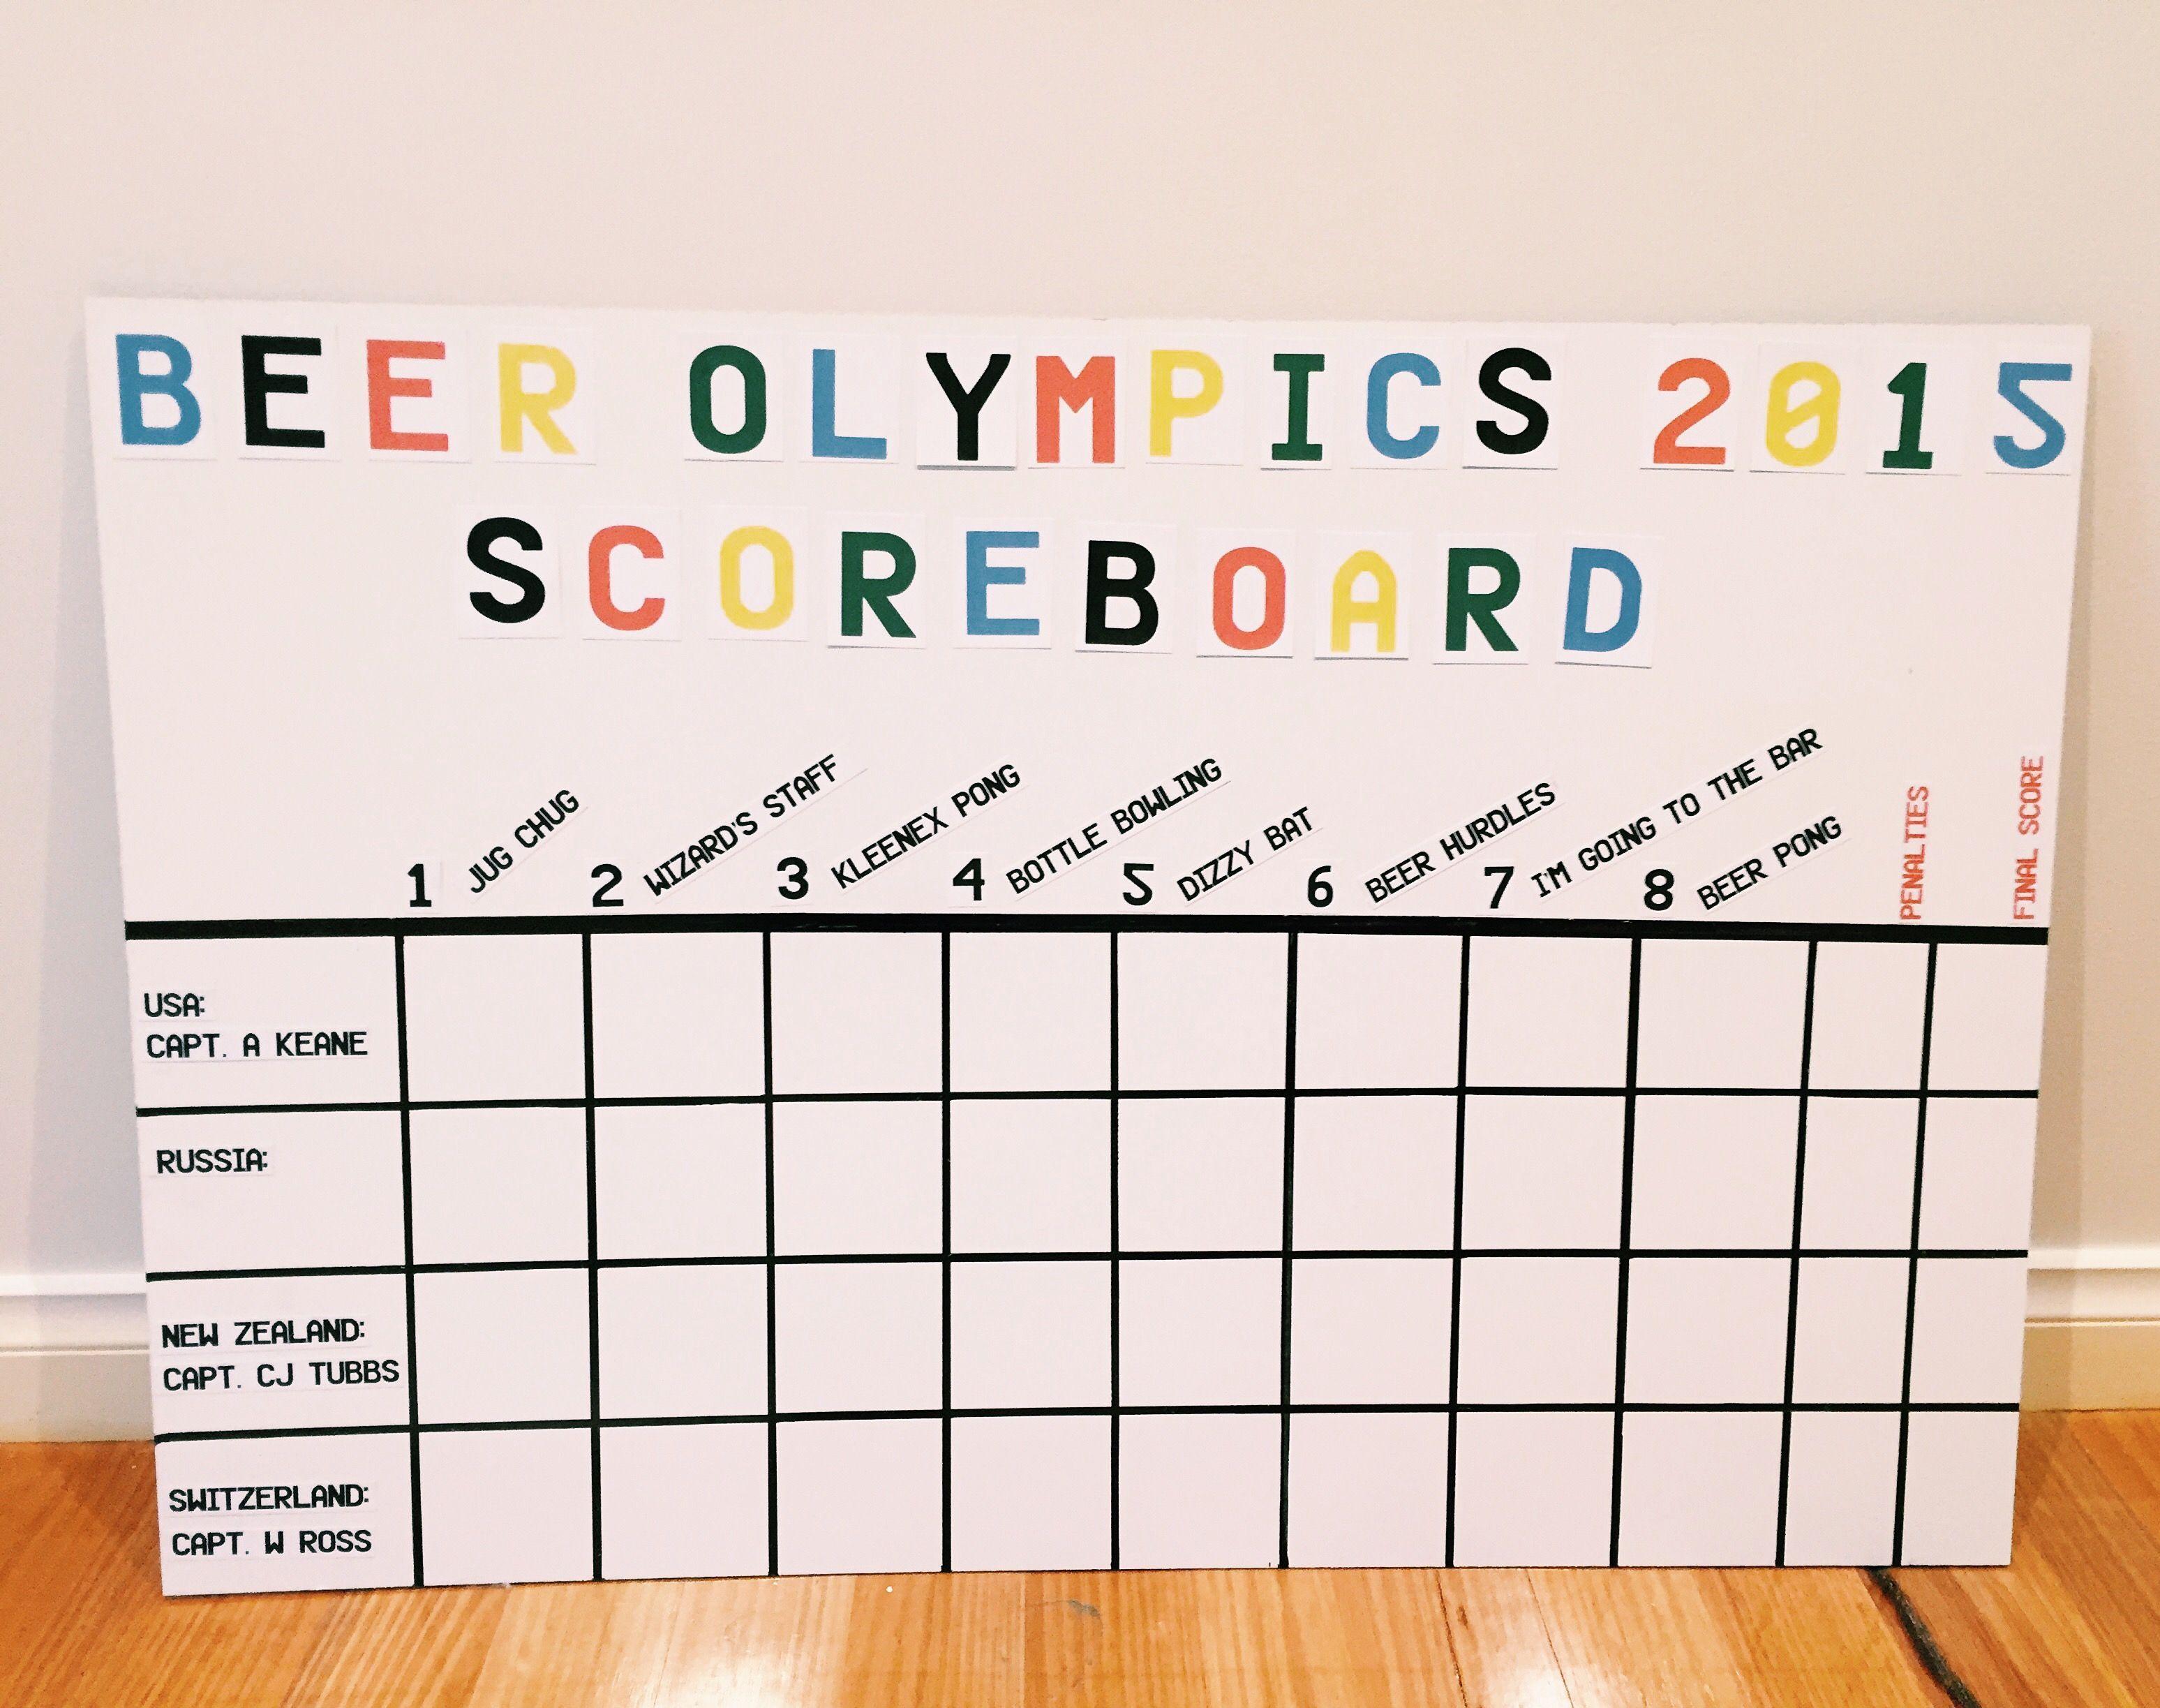 Beer Olympics Scoreboard … Beer olympics scoreboard